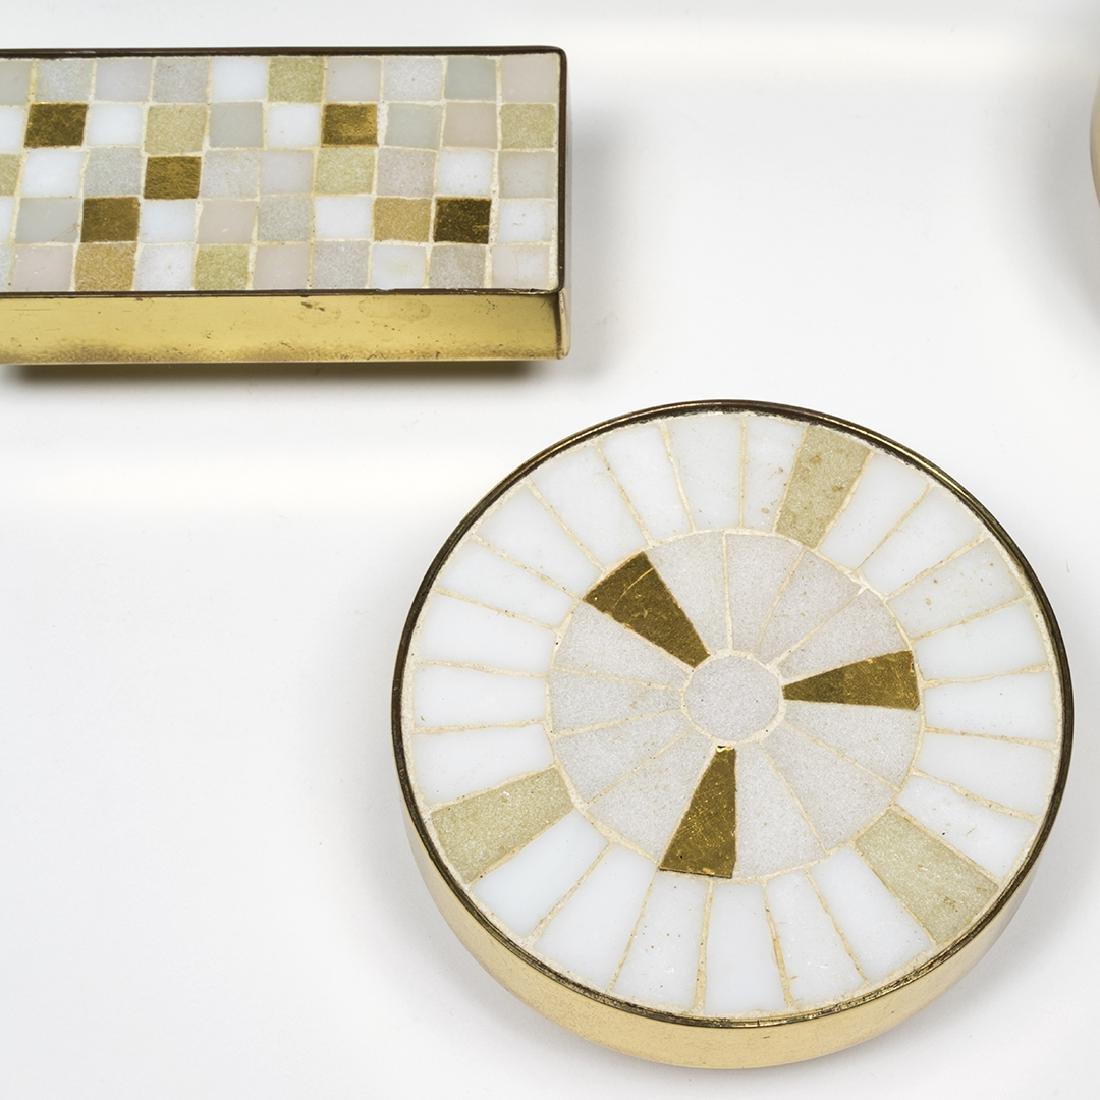 Tiled Brass Cabinet Pulls - 5